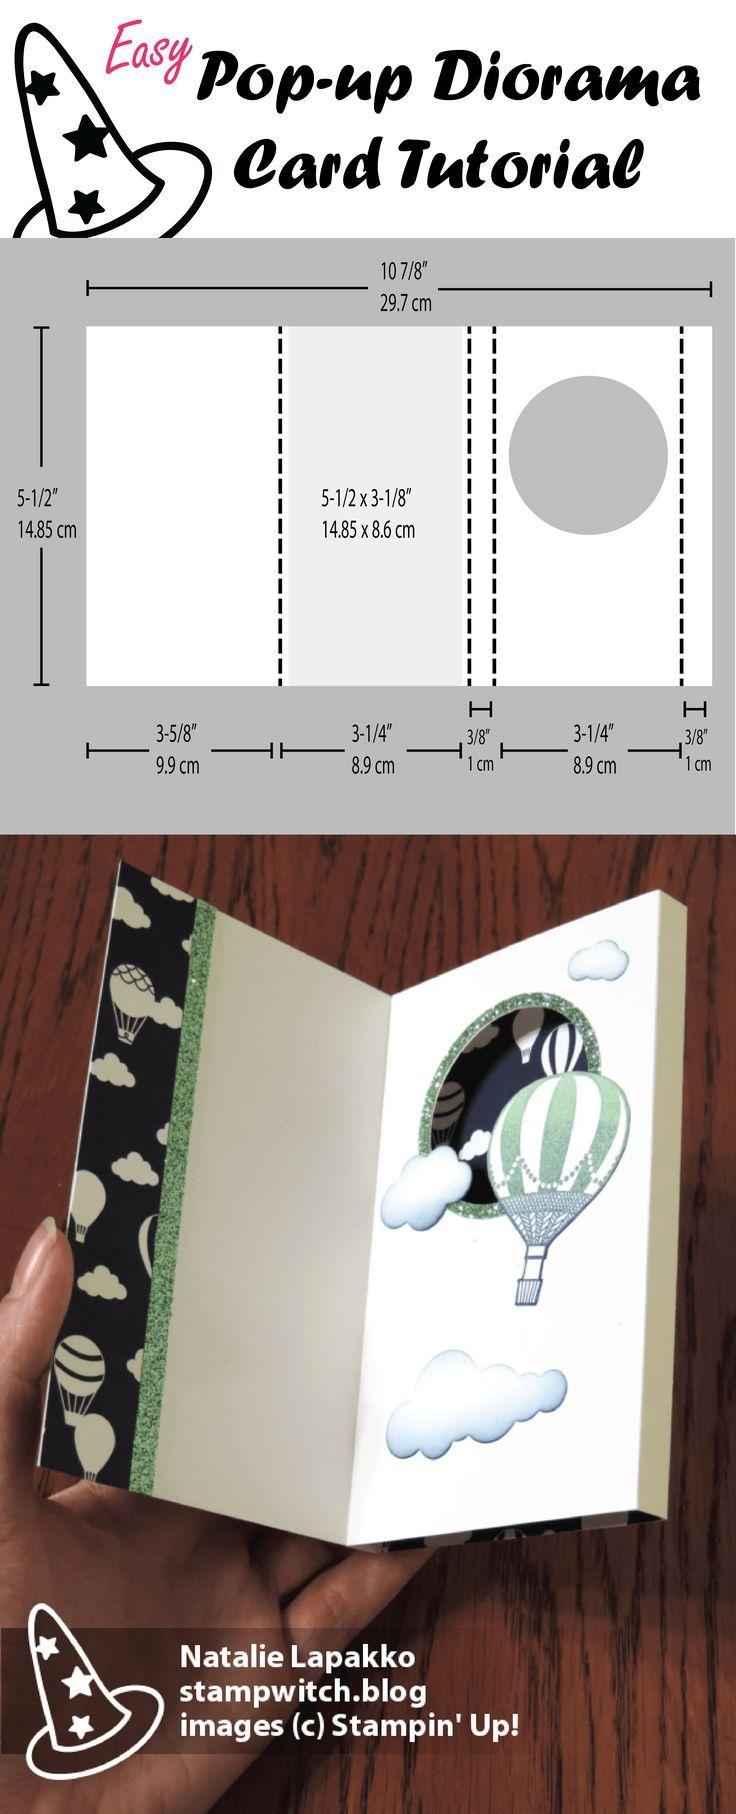 Pop-up Diorama Tutorial | Card tutorials, Dioramas and Tutorials